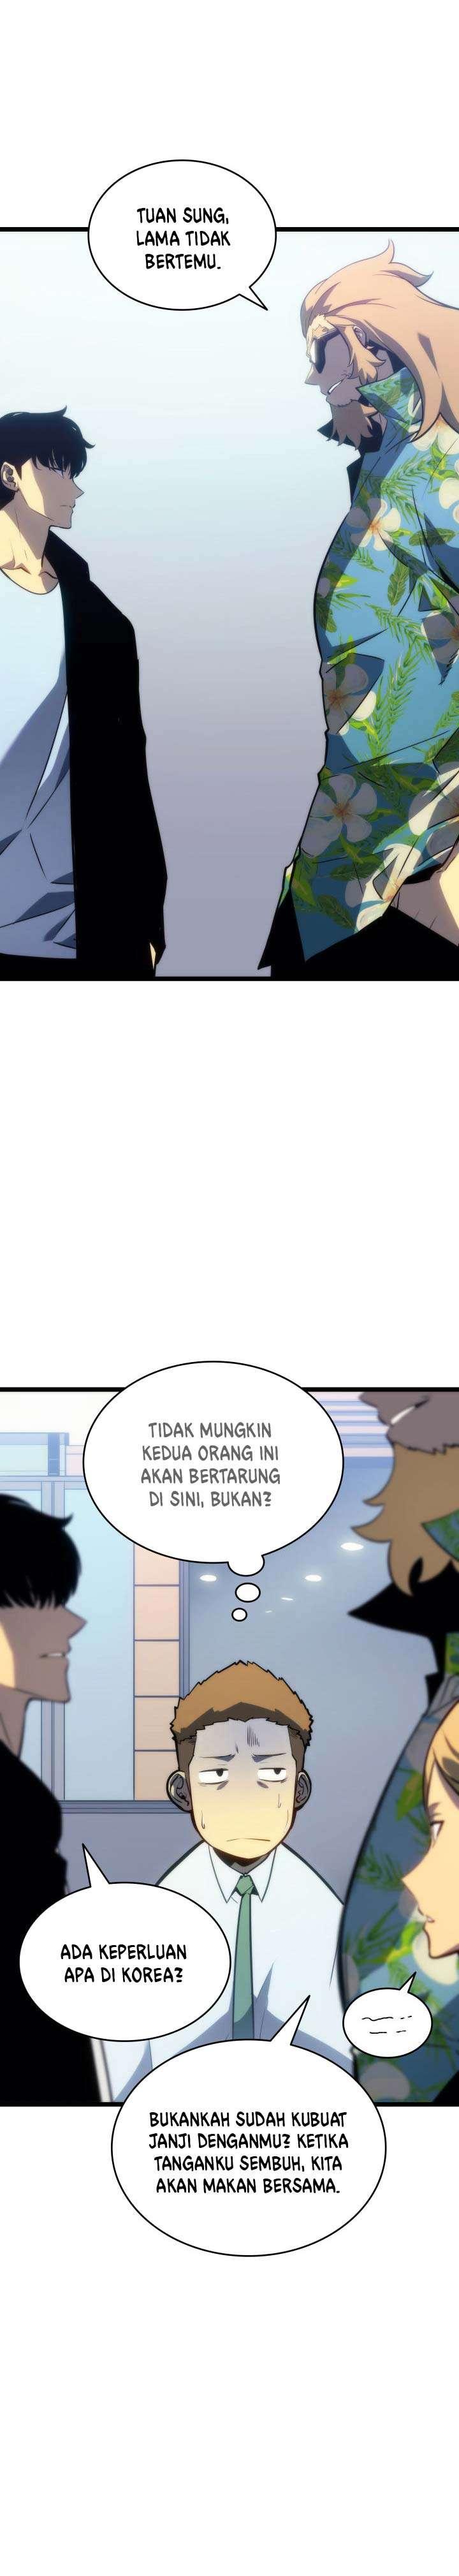 Solo Leveling Chapter 153 - Komik Terbaru